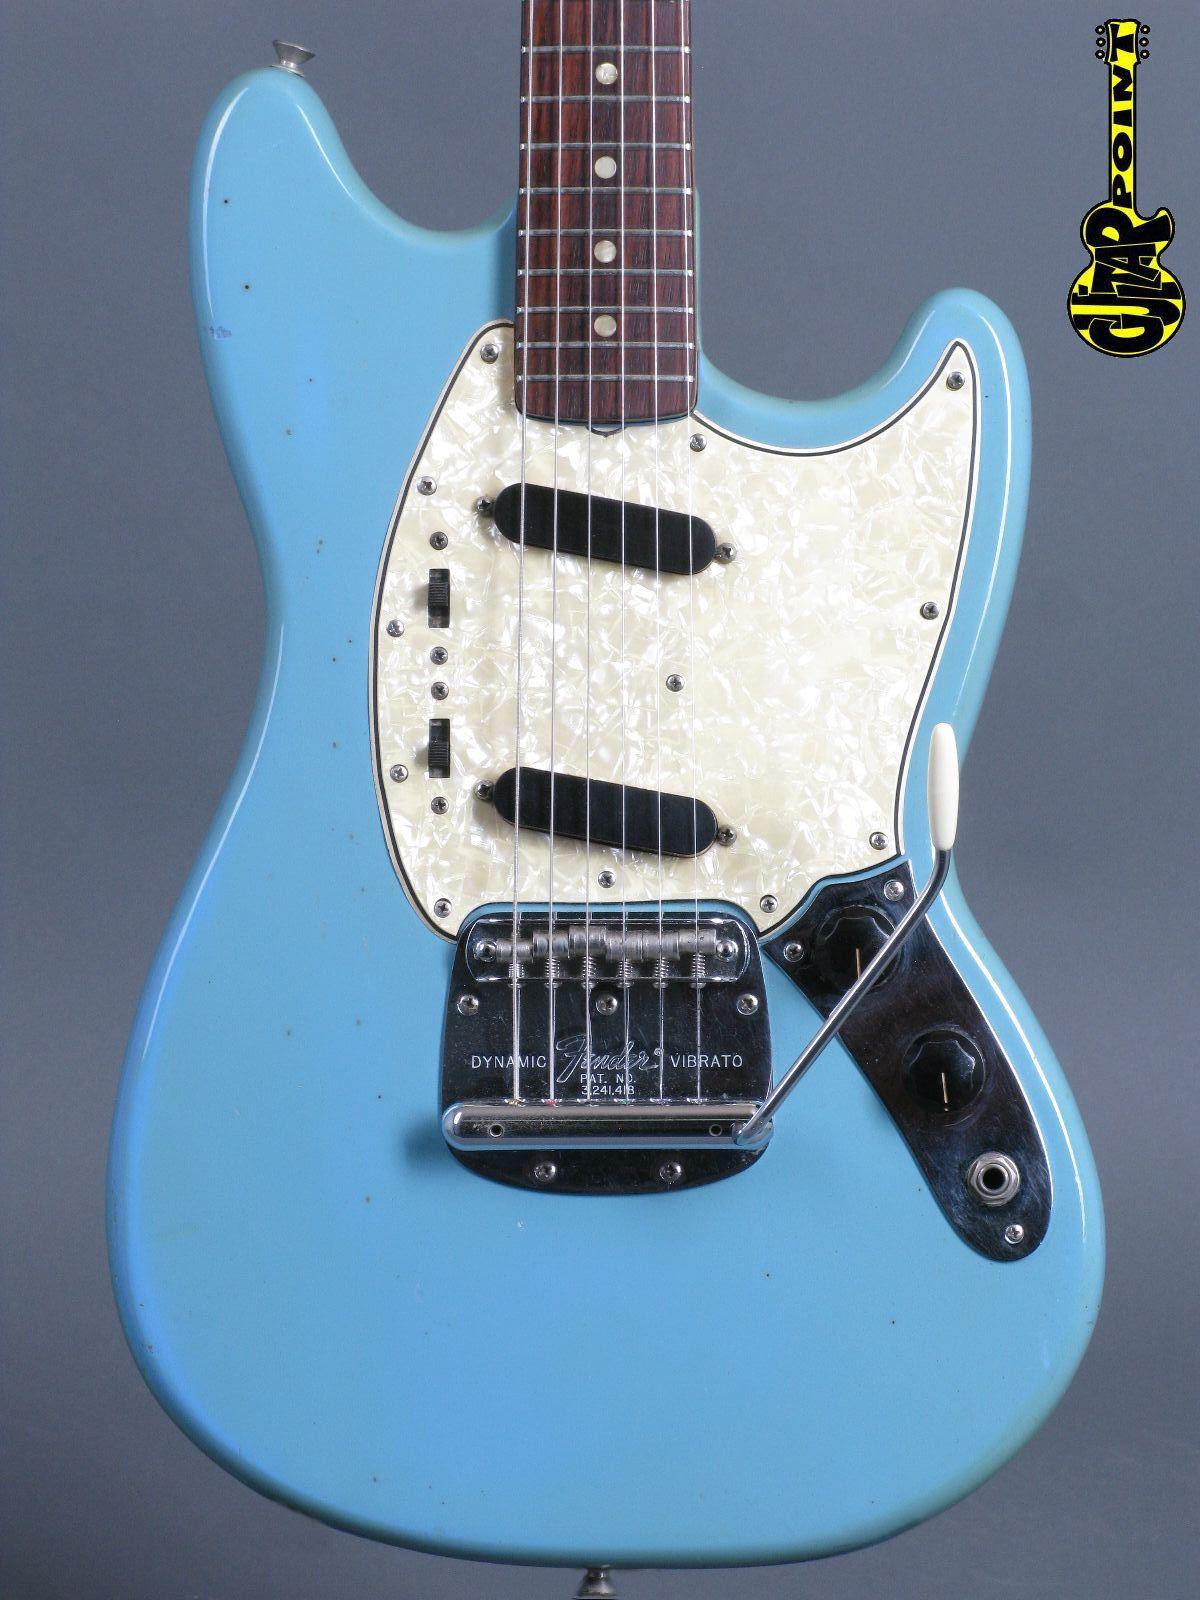 1966 Fender Mustang - Daphne Blue